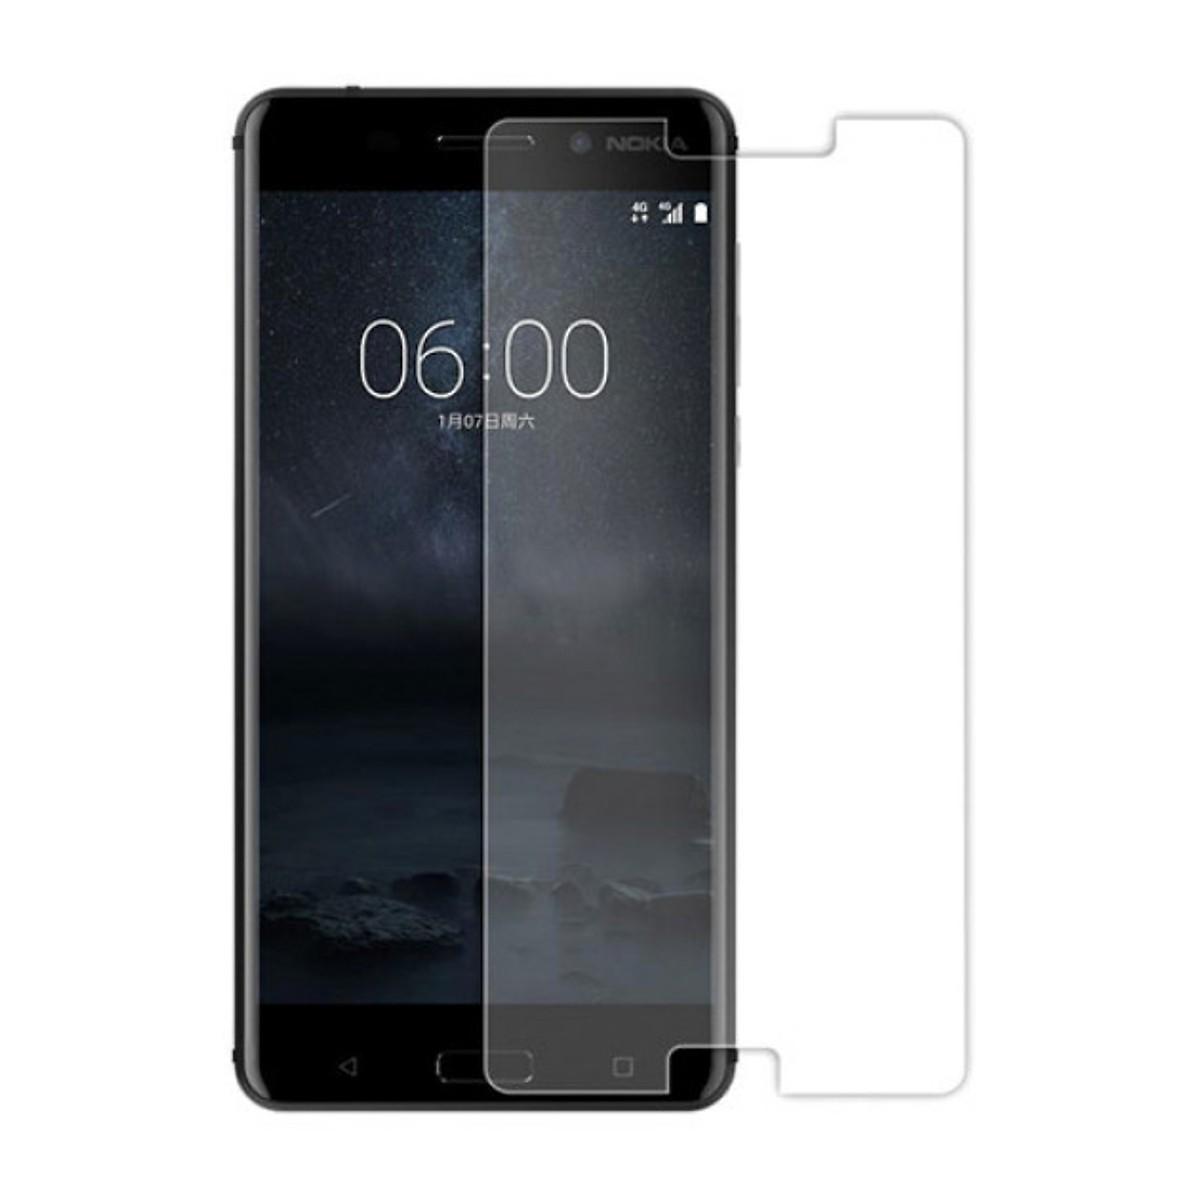 Miếng dán cường lực cho Nokia 5